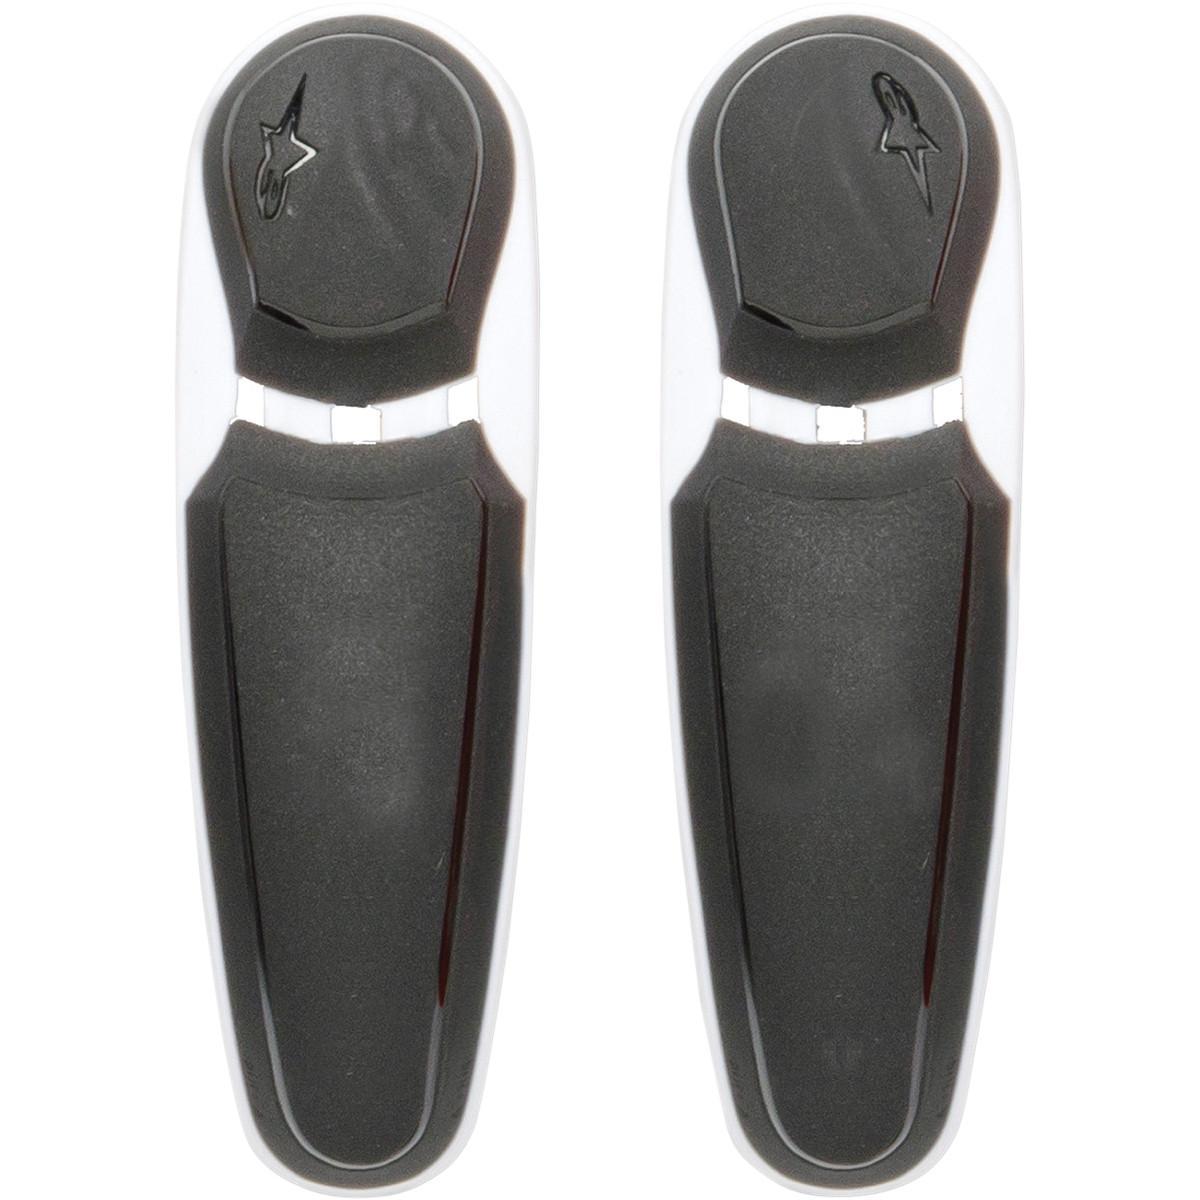 new alpinestars toe sliders for smx plus boots all sizes colors ebay. Black Bedroom Furniture Sets. Home Design Ideas